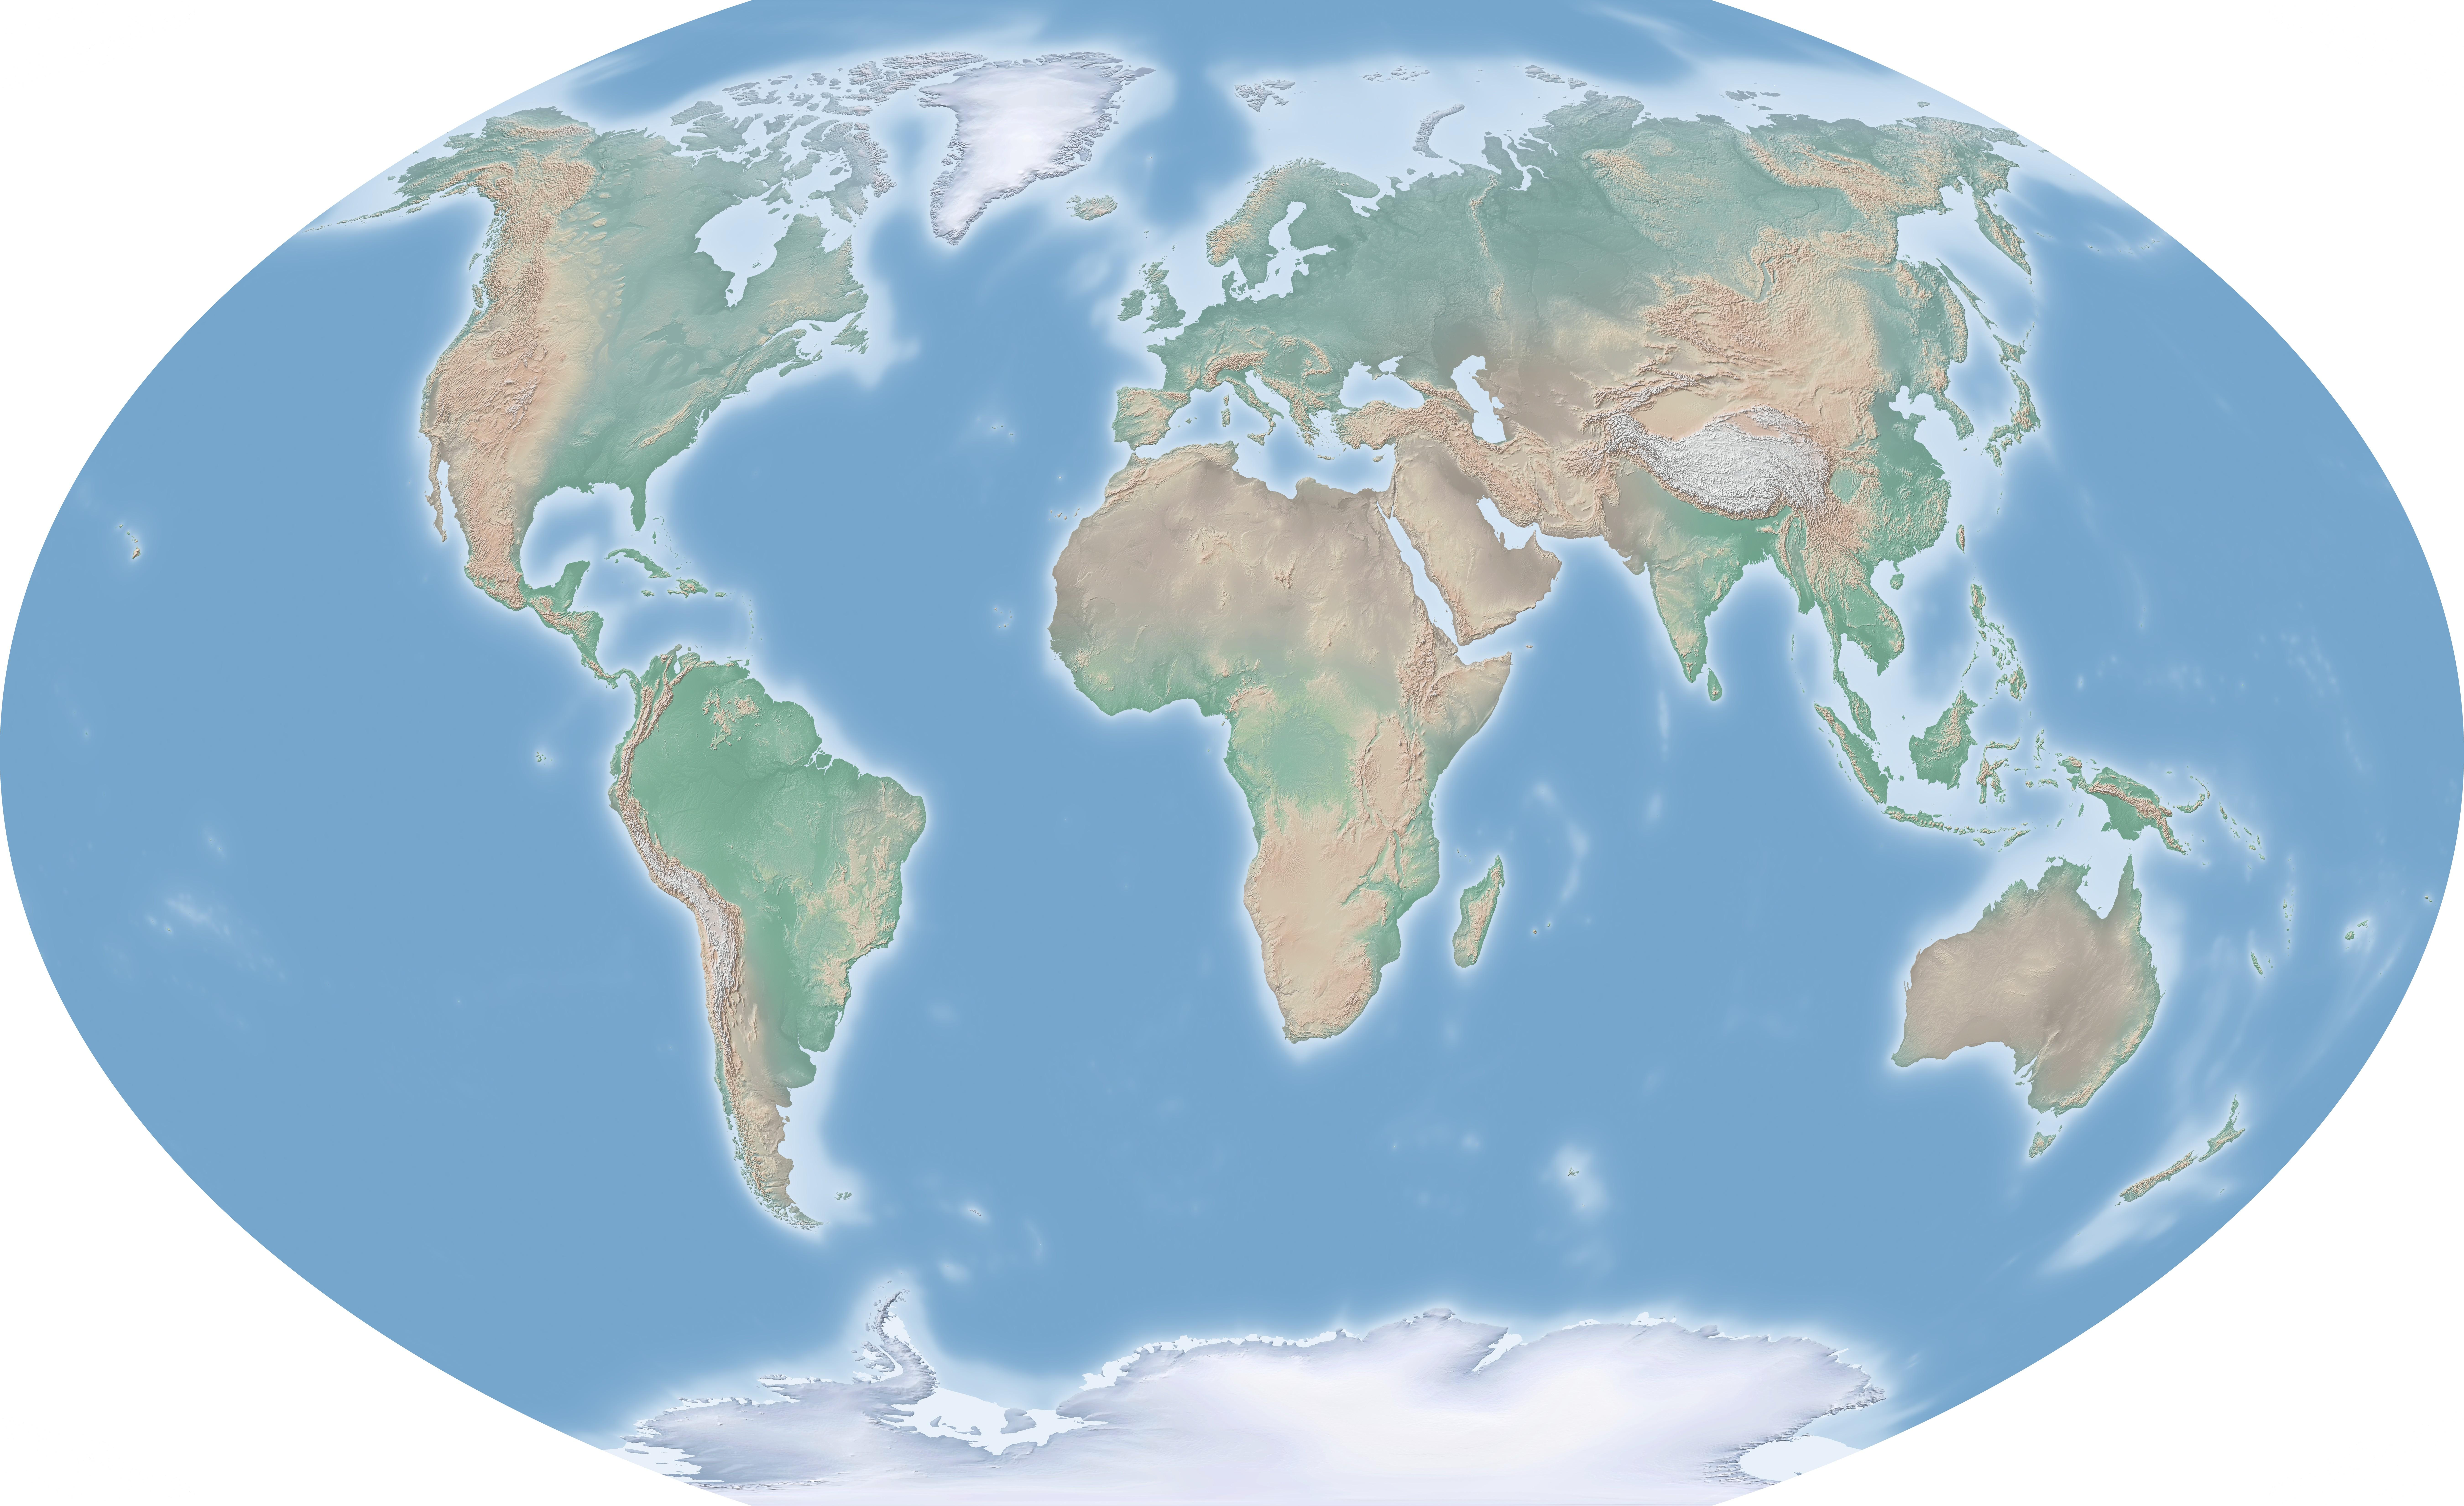 FileWinkeltripelostjpg Wikimedia Commons - Natural world map